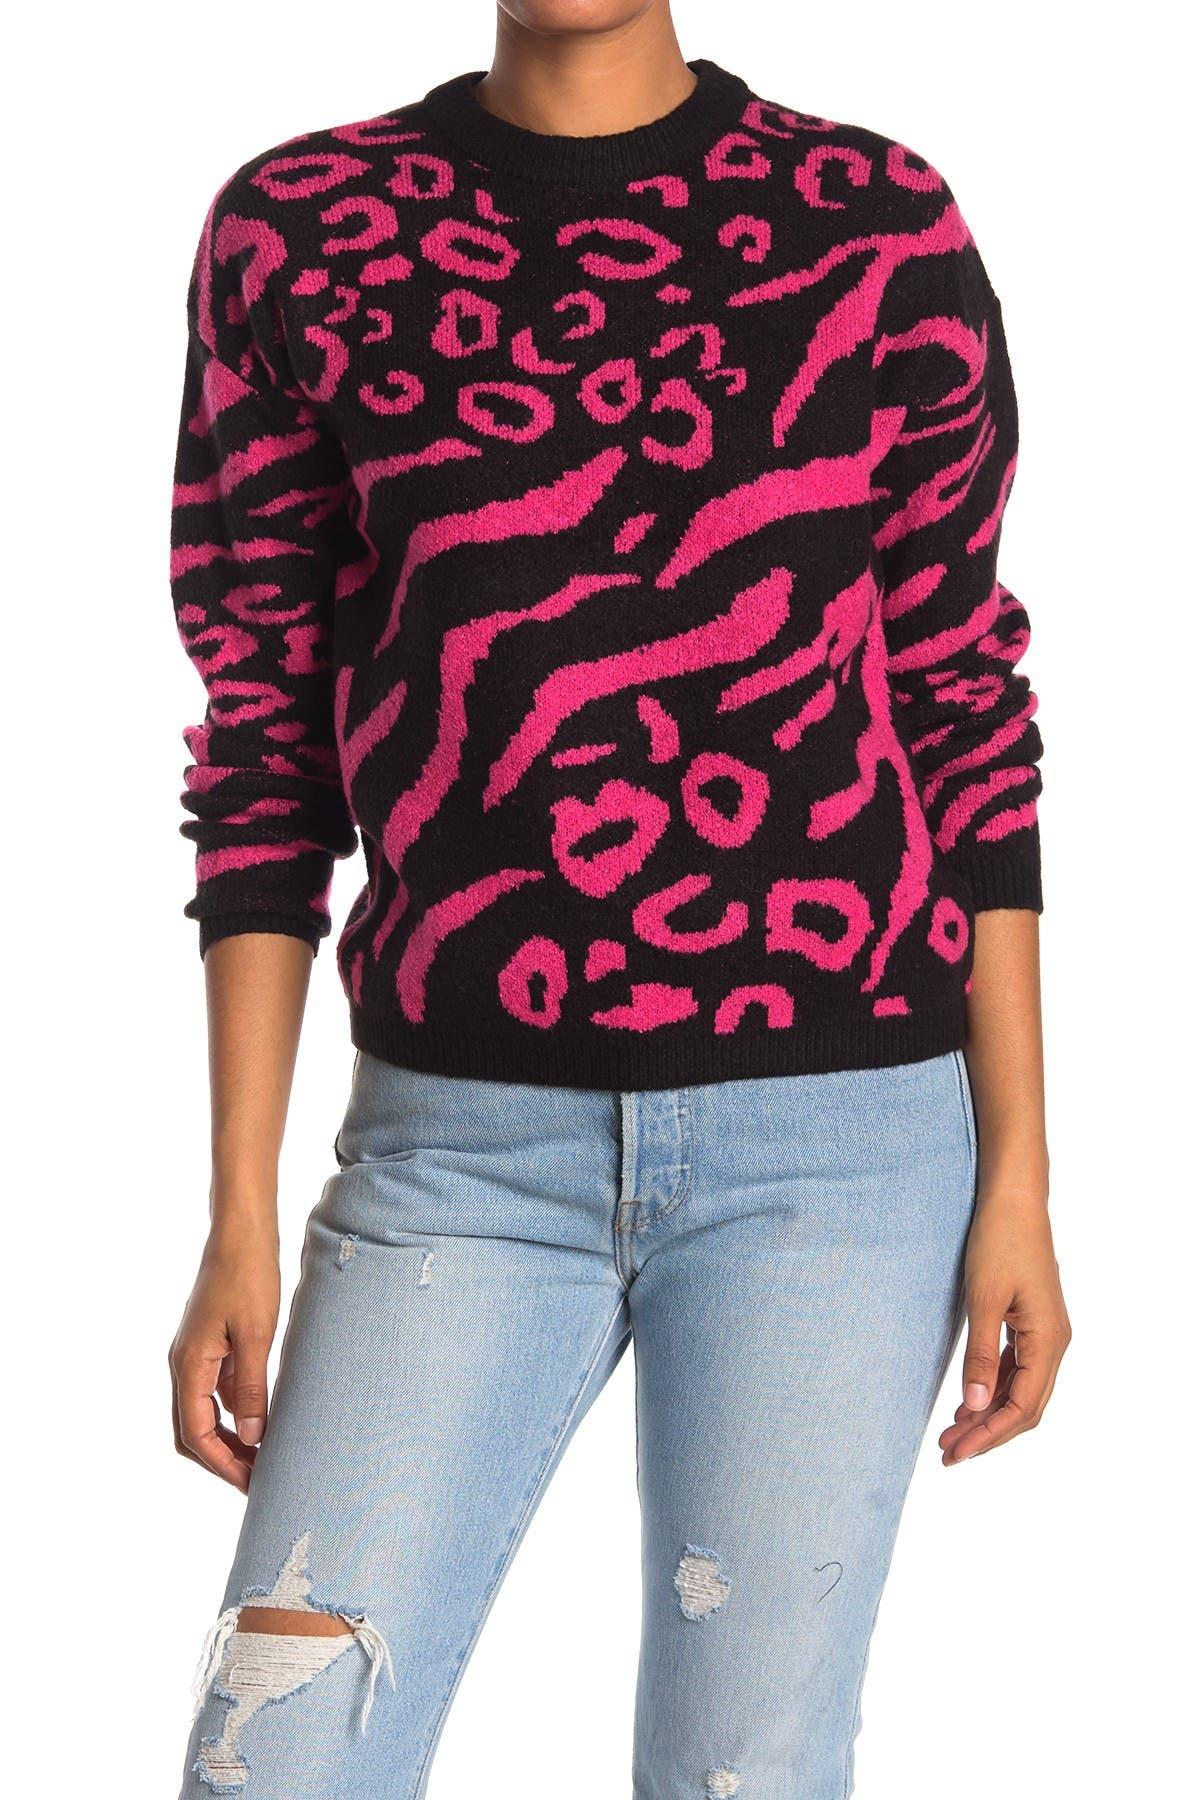 Image of Elodie Animal Print Crew Neck Sweater